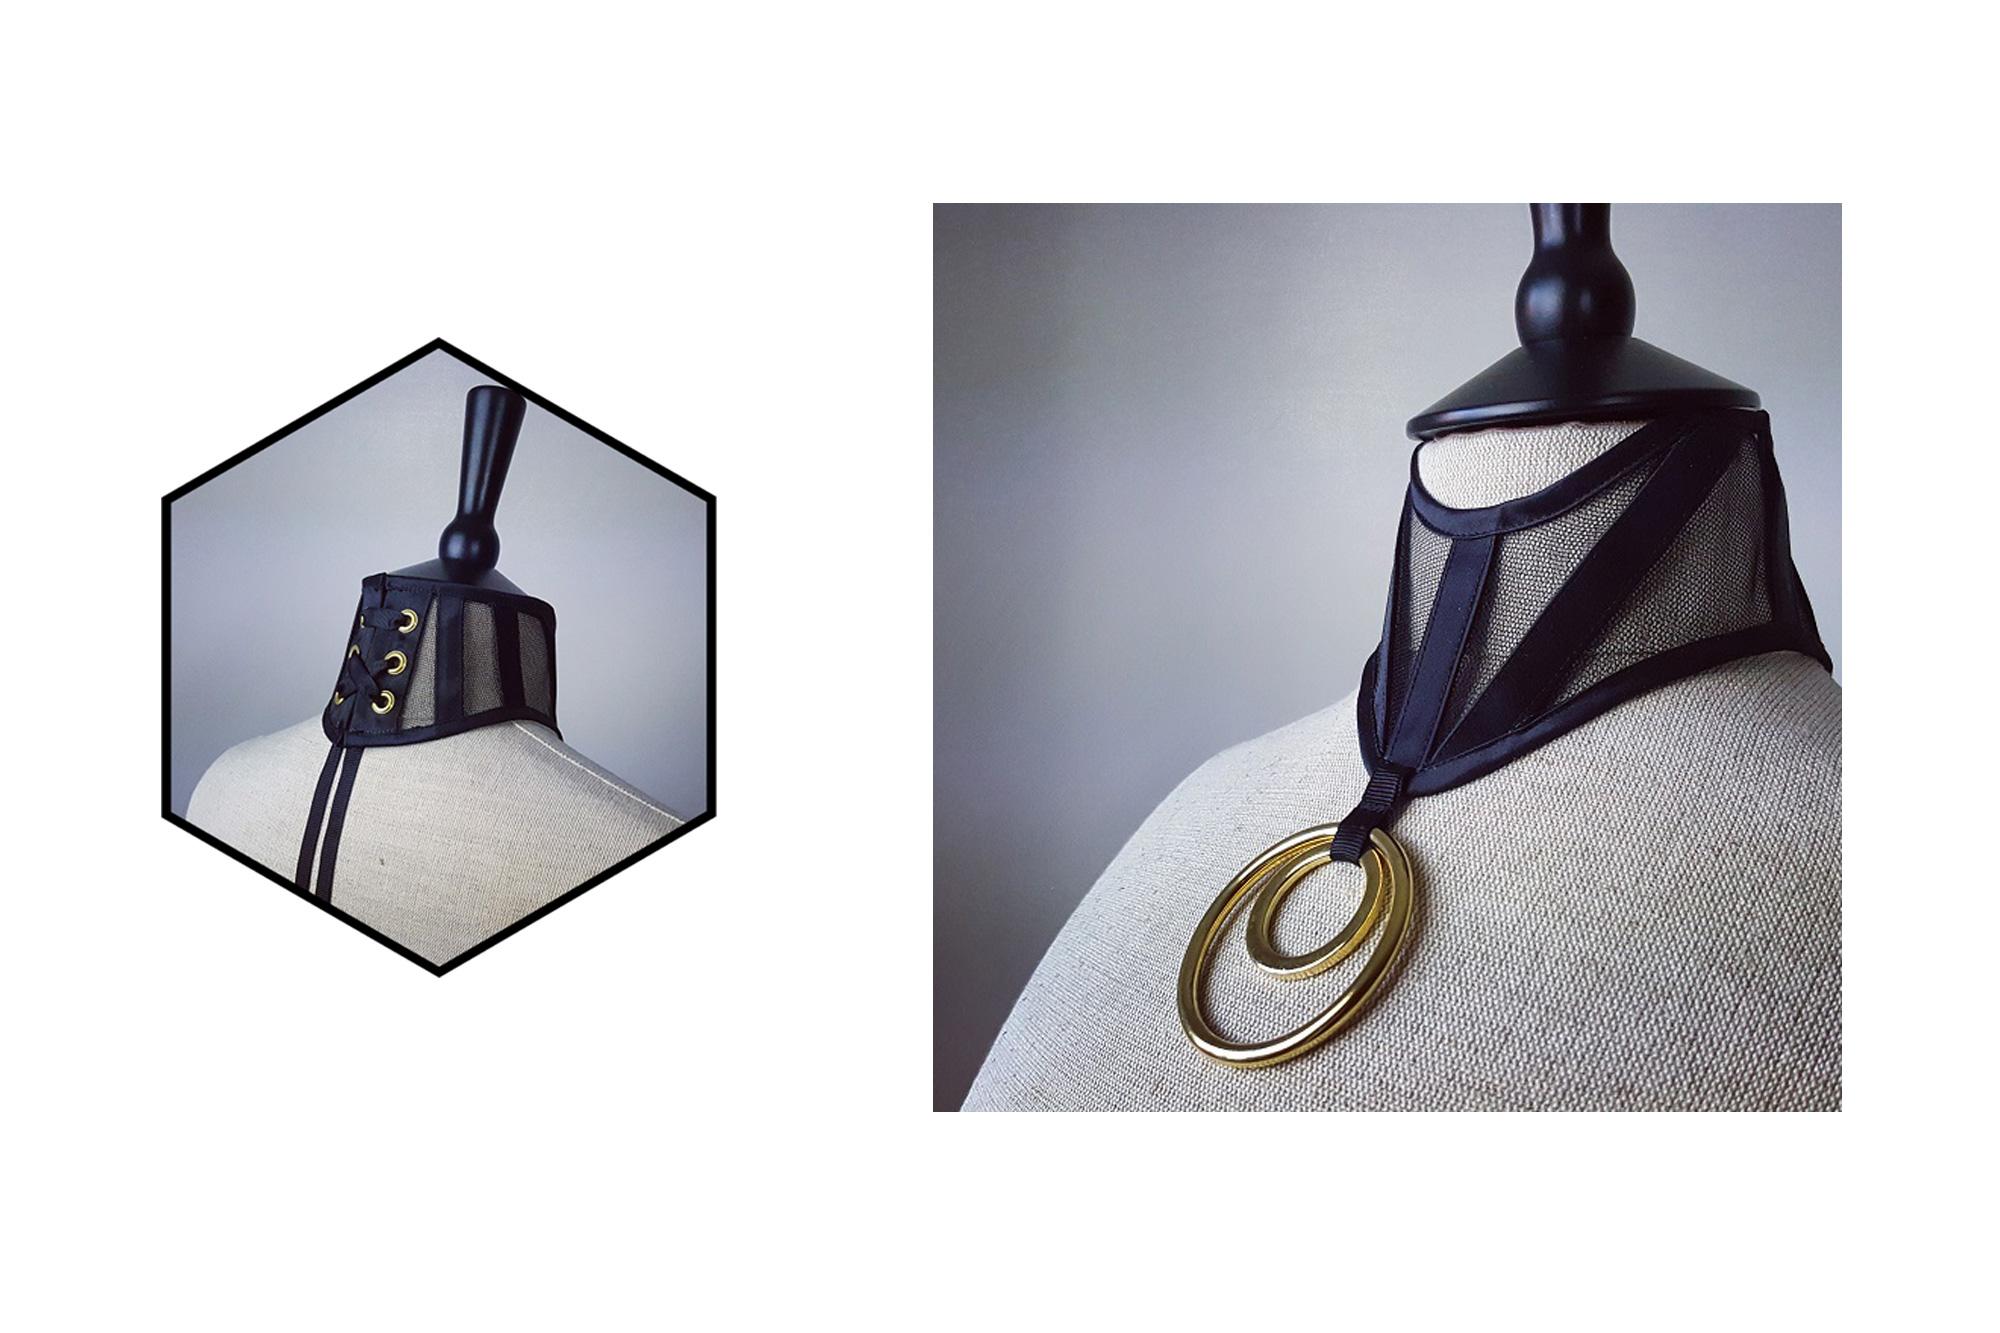 [Вещь недели] Чокер-корсет Orchid Corsetry Isolde